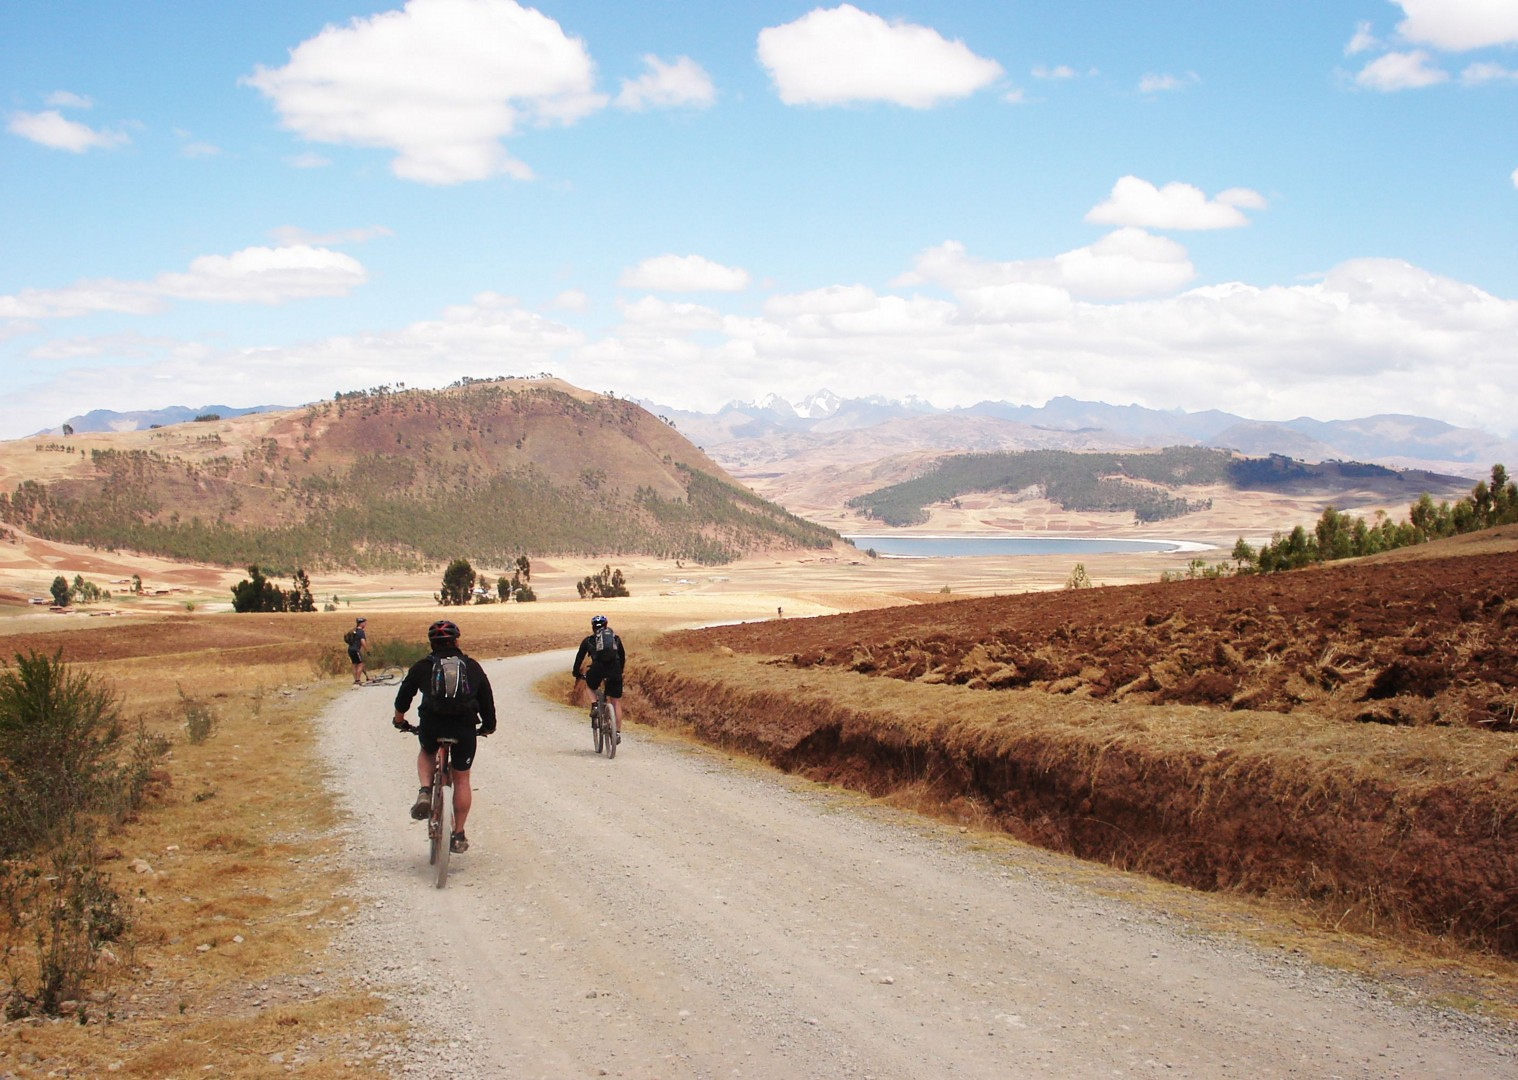 canon-de-tinajani-guided-mountain-bike-holiday-peru-andean-journey.JPG - Peru - Andean Journey - Guided Mountain Bike Holiday - Mountain Biking